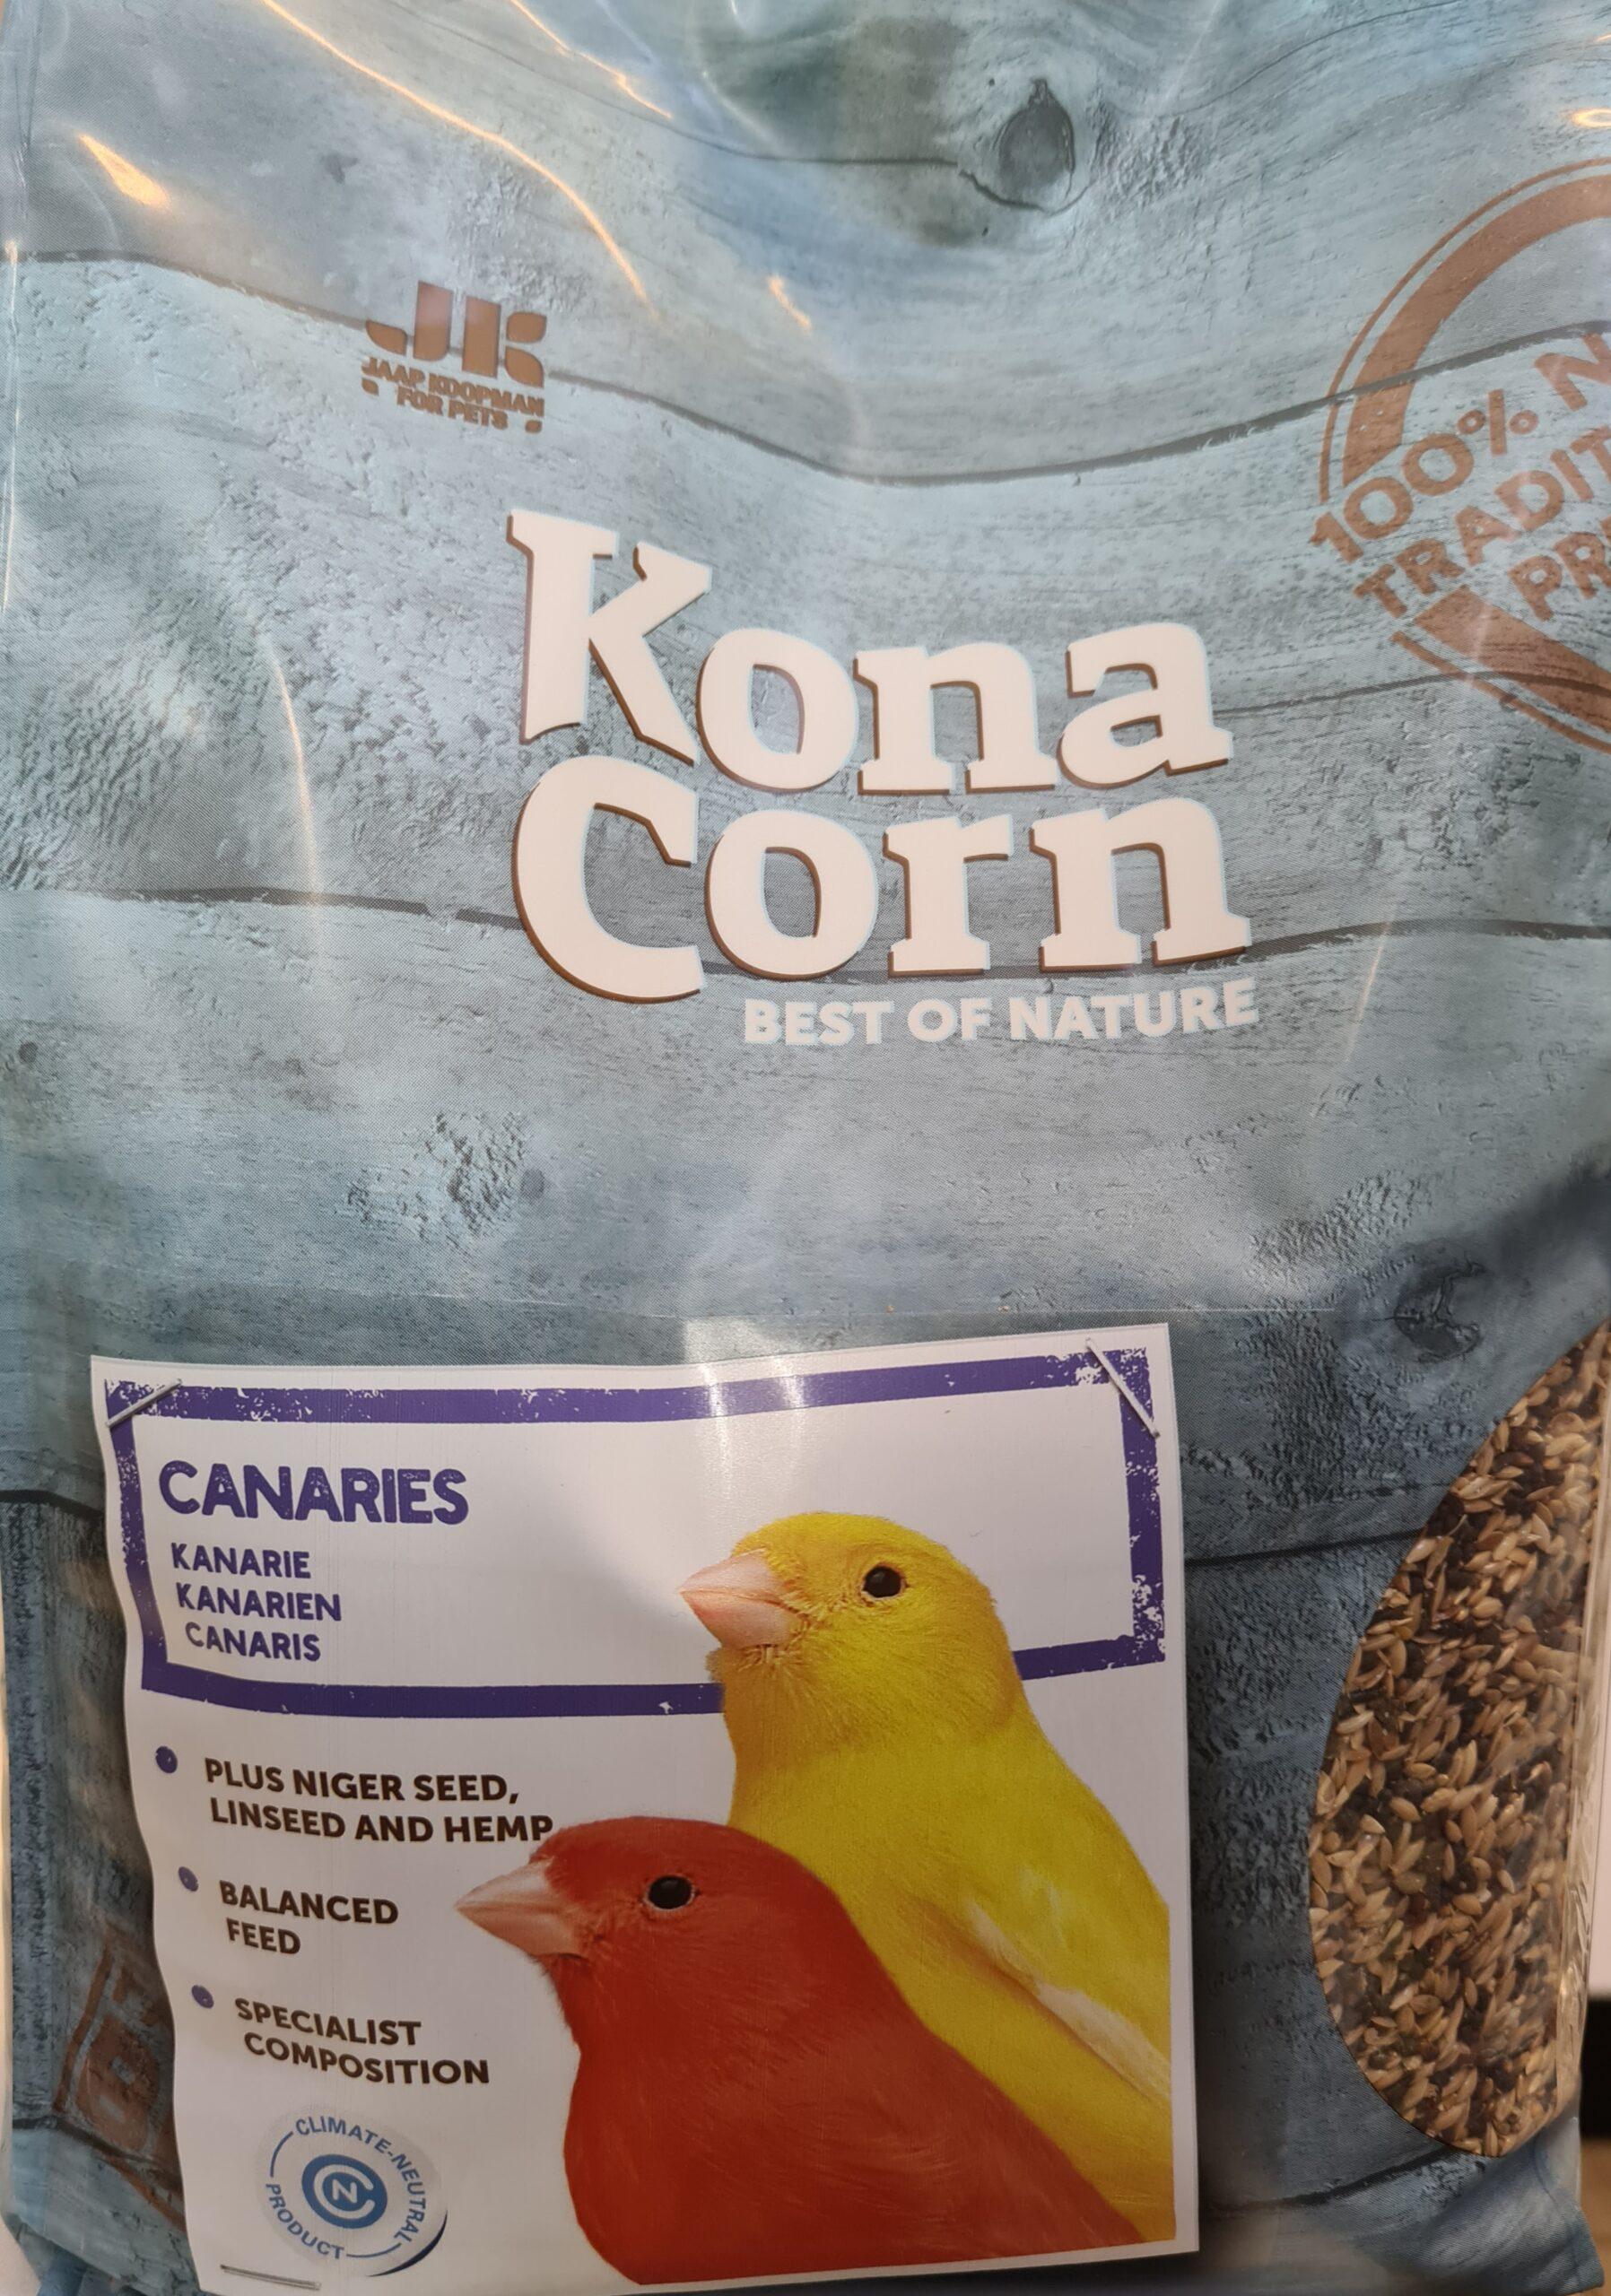 KonaCorn Kanariezaad